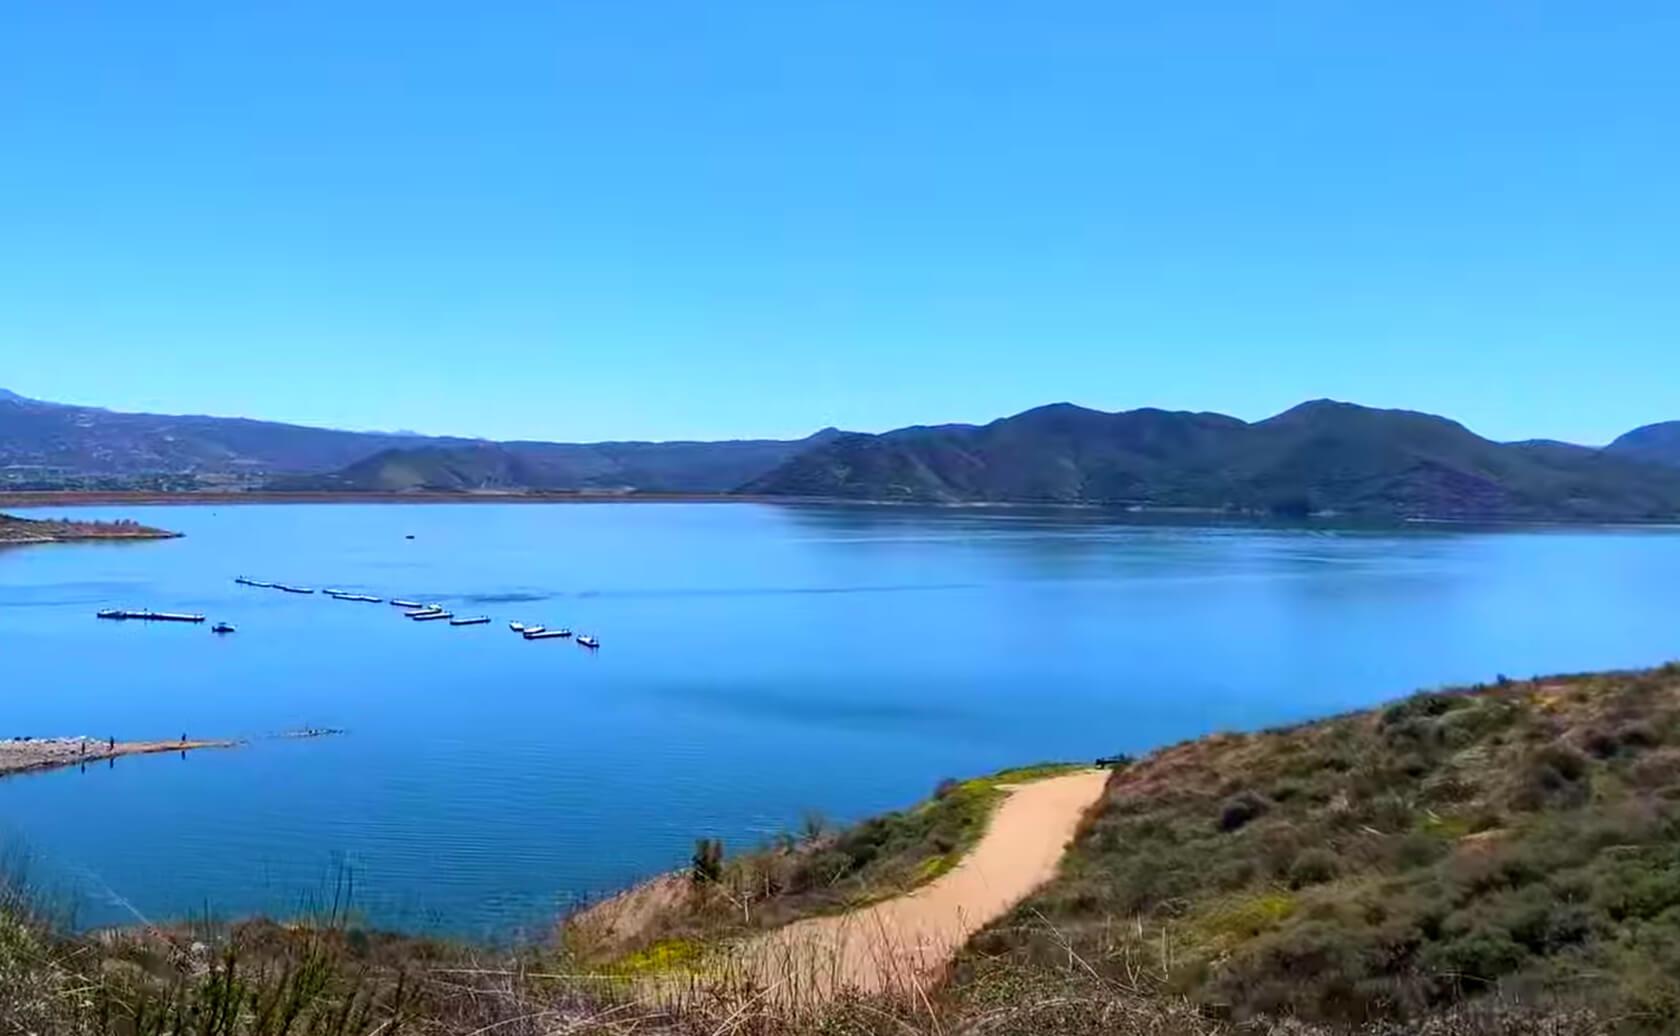 Diamond-Valley-Lake-Fishing-Guide-Report-Hemet-CA-06